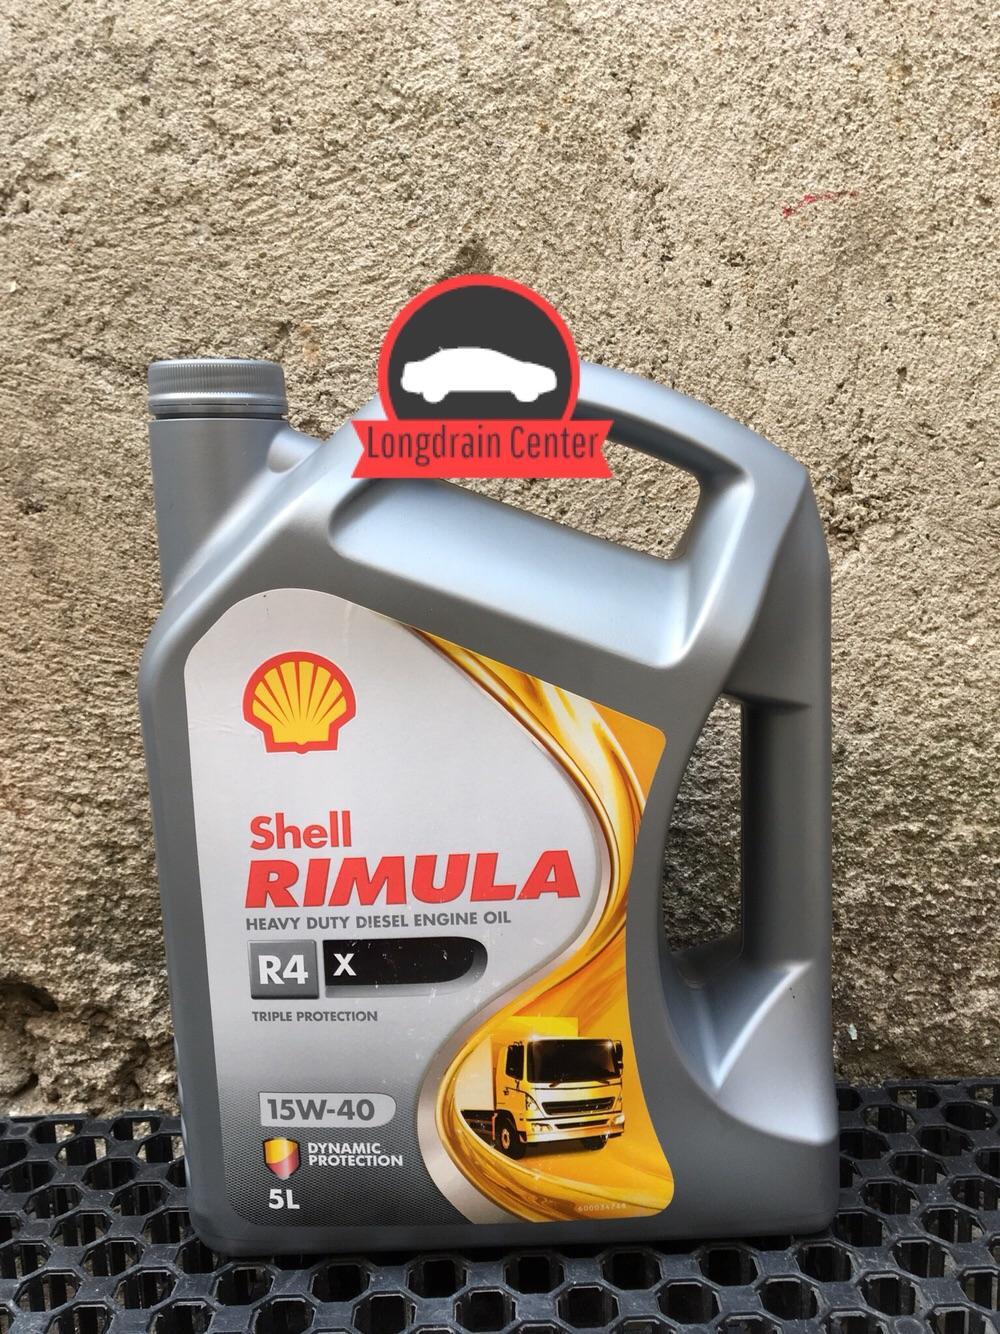 Auto Oils Fluids Shell Helix Ultra 5w 40 Api Sn Cf Fully Synthetic Oil Pelumas Oli Mesin Mobil 4 Liter Rimula R4x 15w40 5 Original